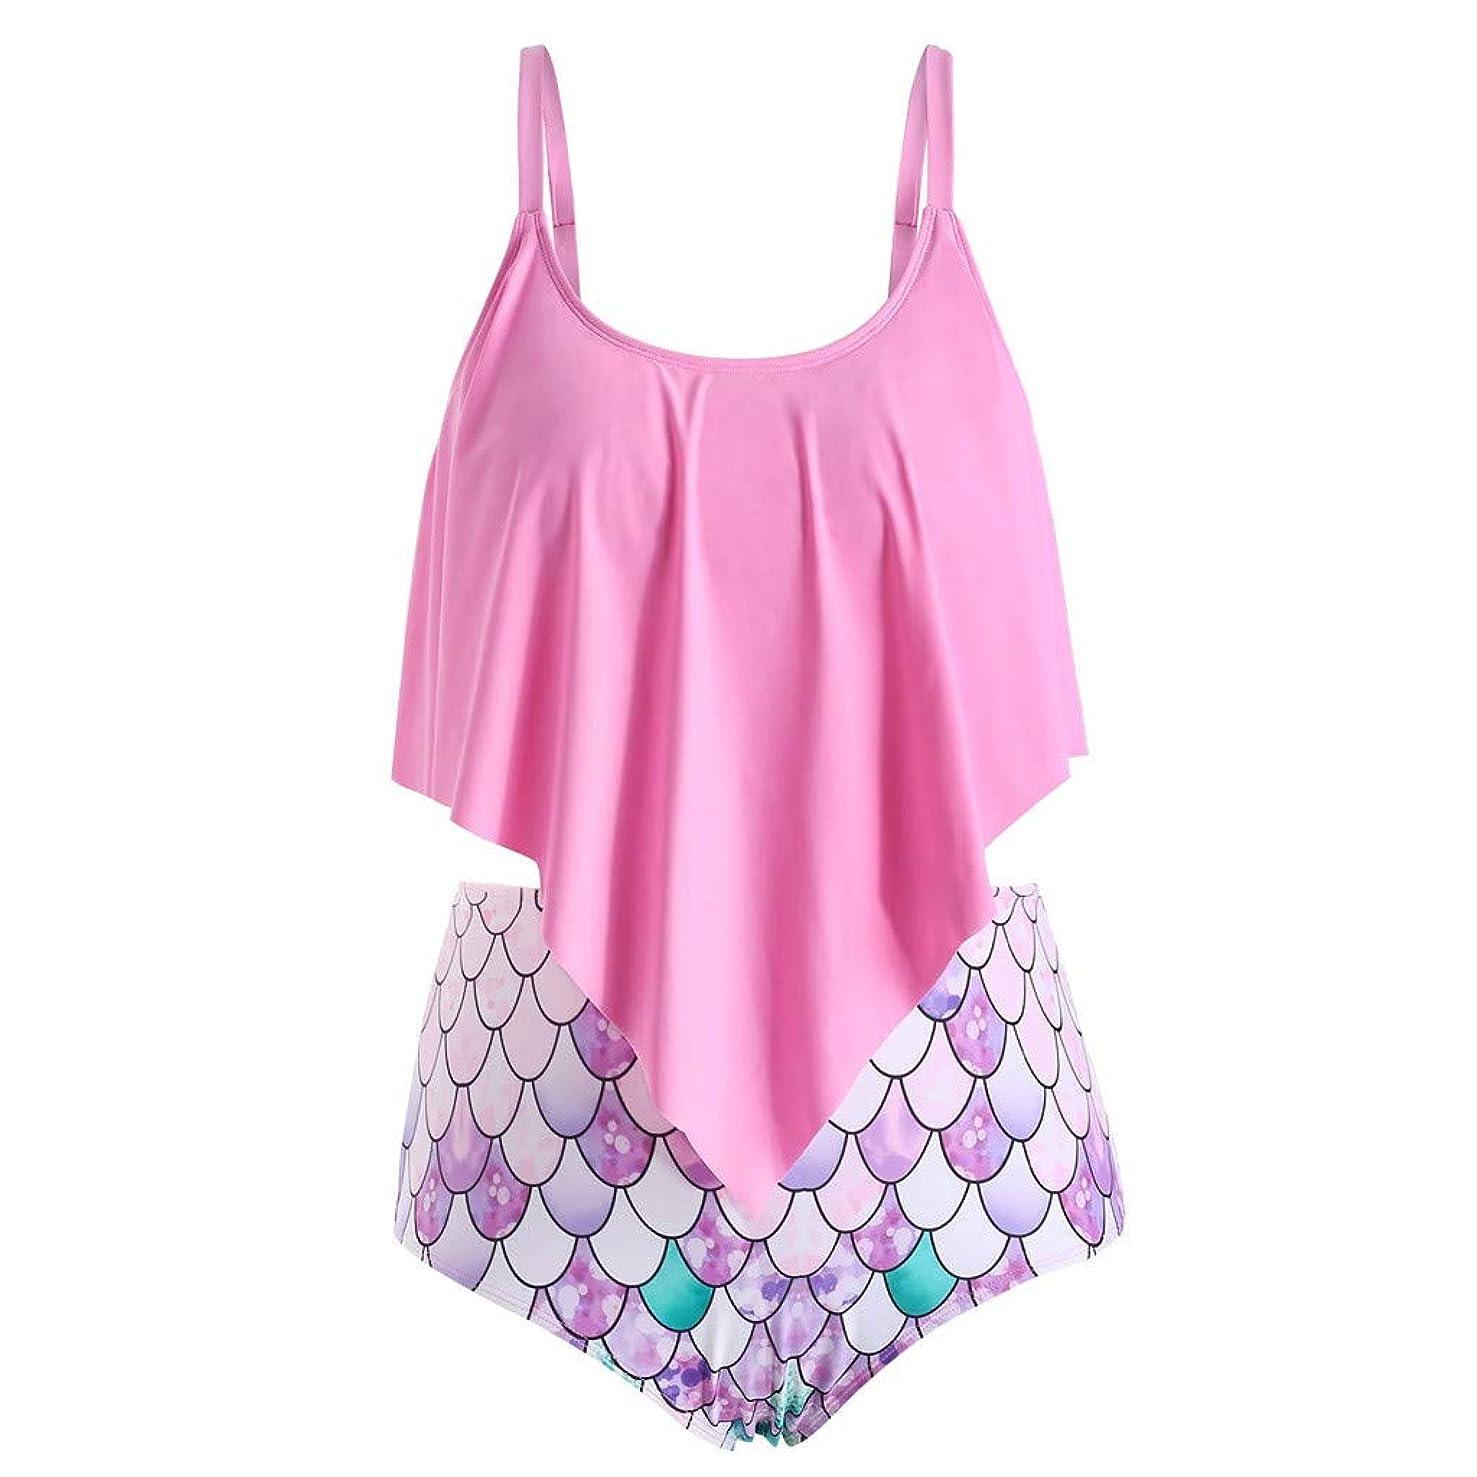 Mermaid Scales Print Tankini Swimsuits, High Waisted Swim Bottom with Ruffle Bandeau Top Beach Bikini Hot Sexy Swimwear